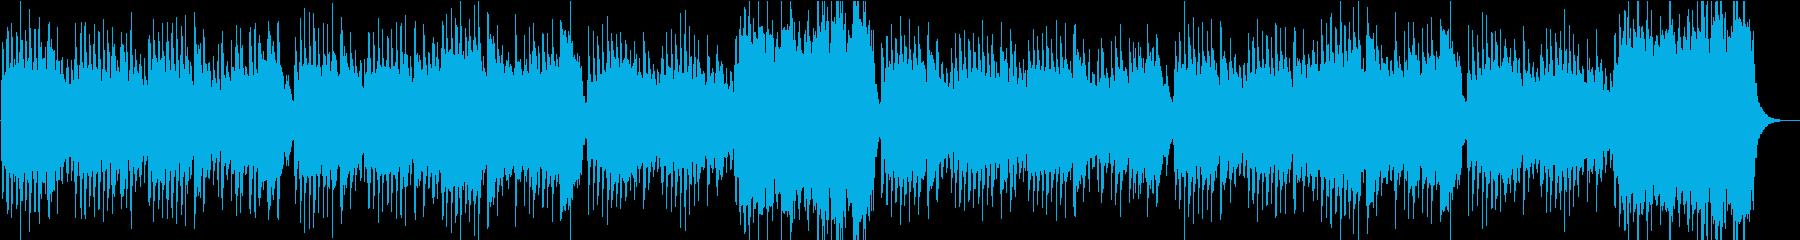 Gavotte in D Major Orchestra ver's reproduced waveform